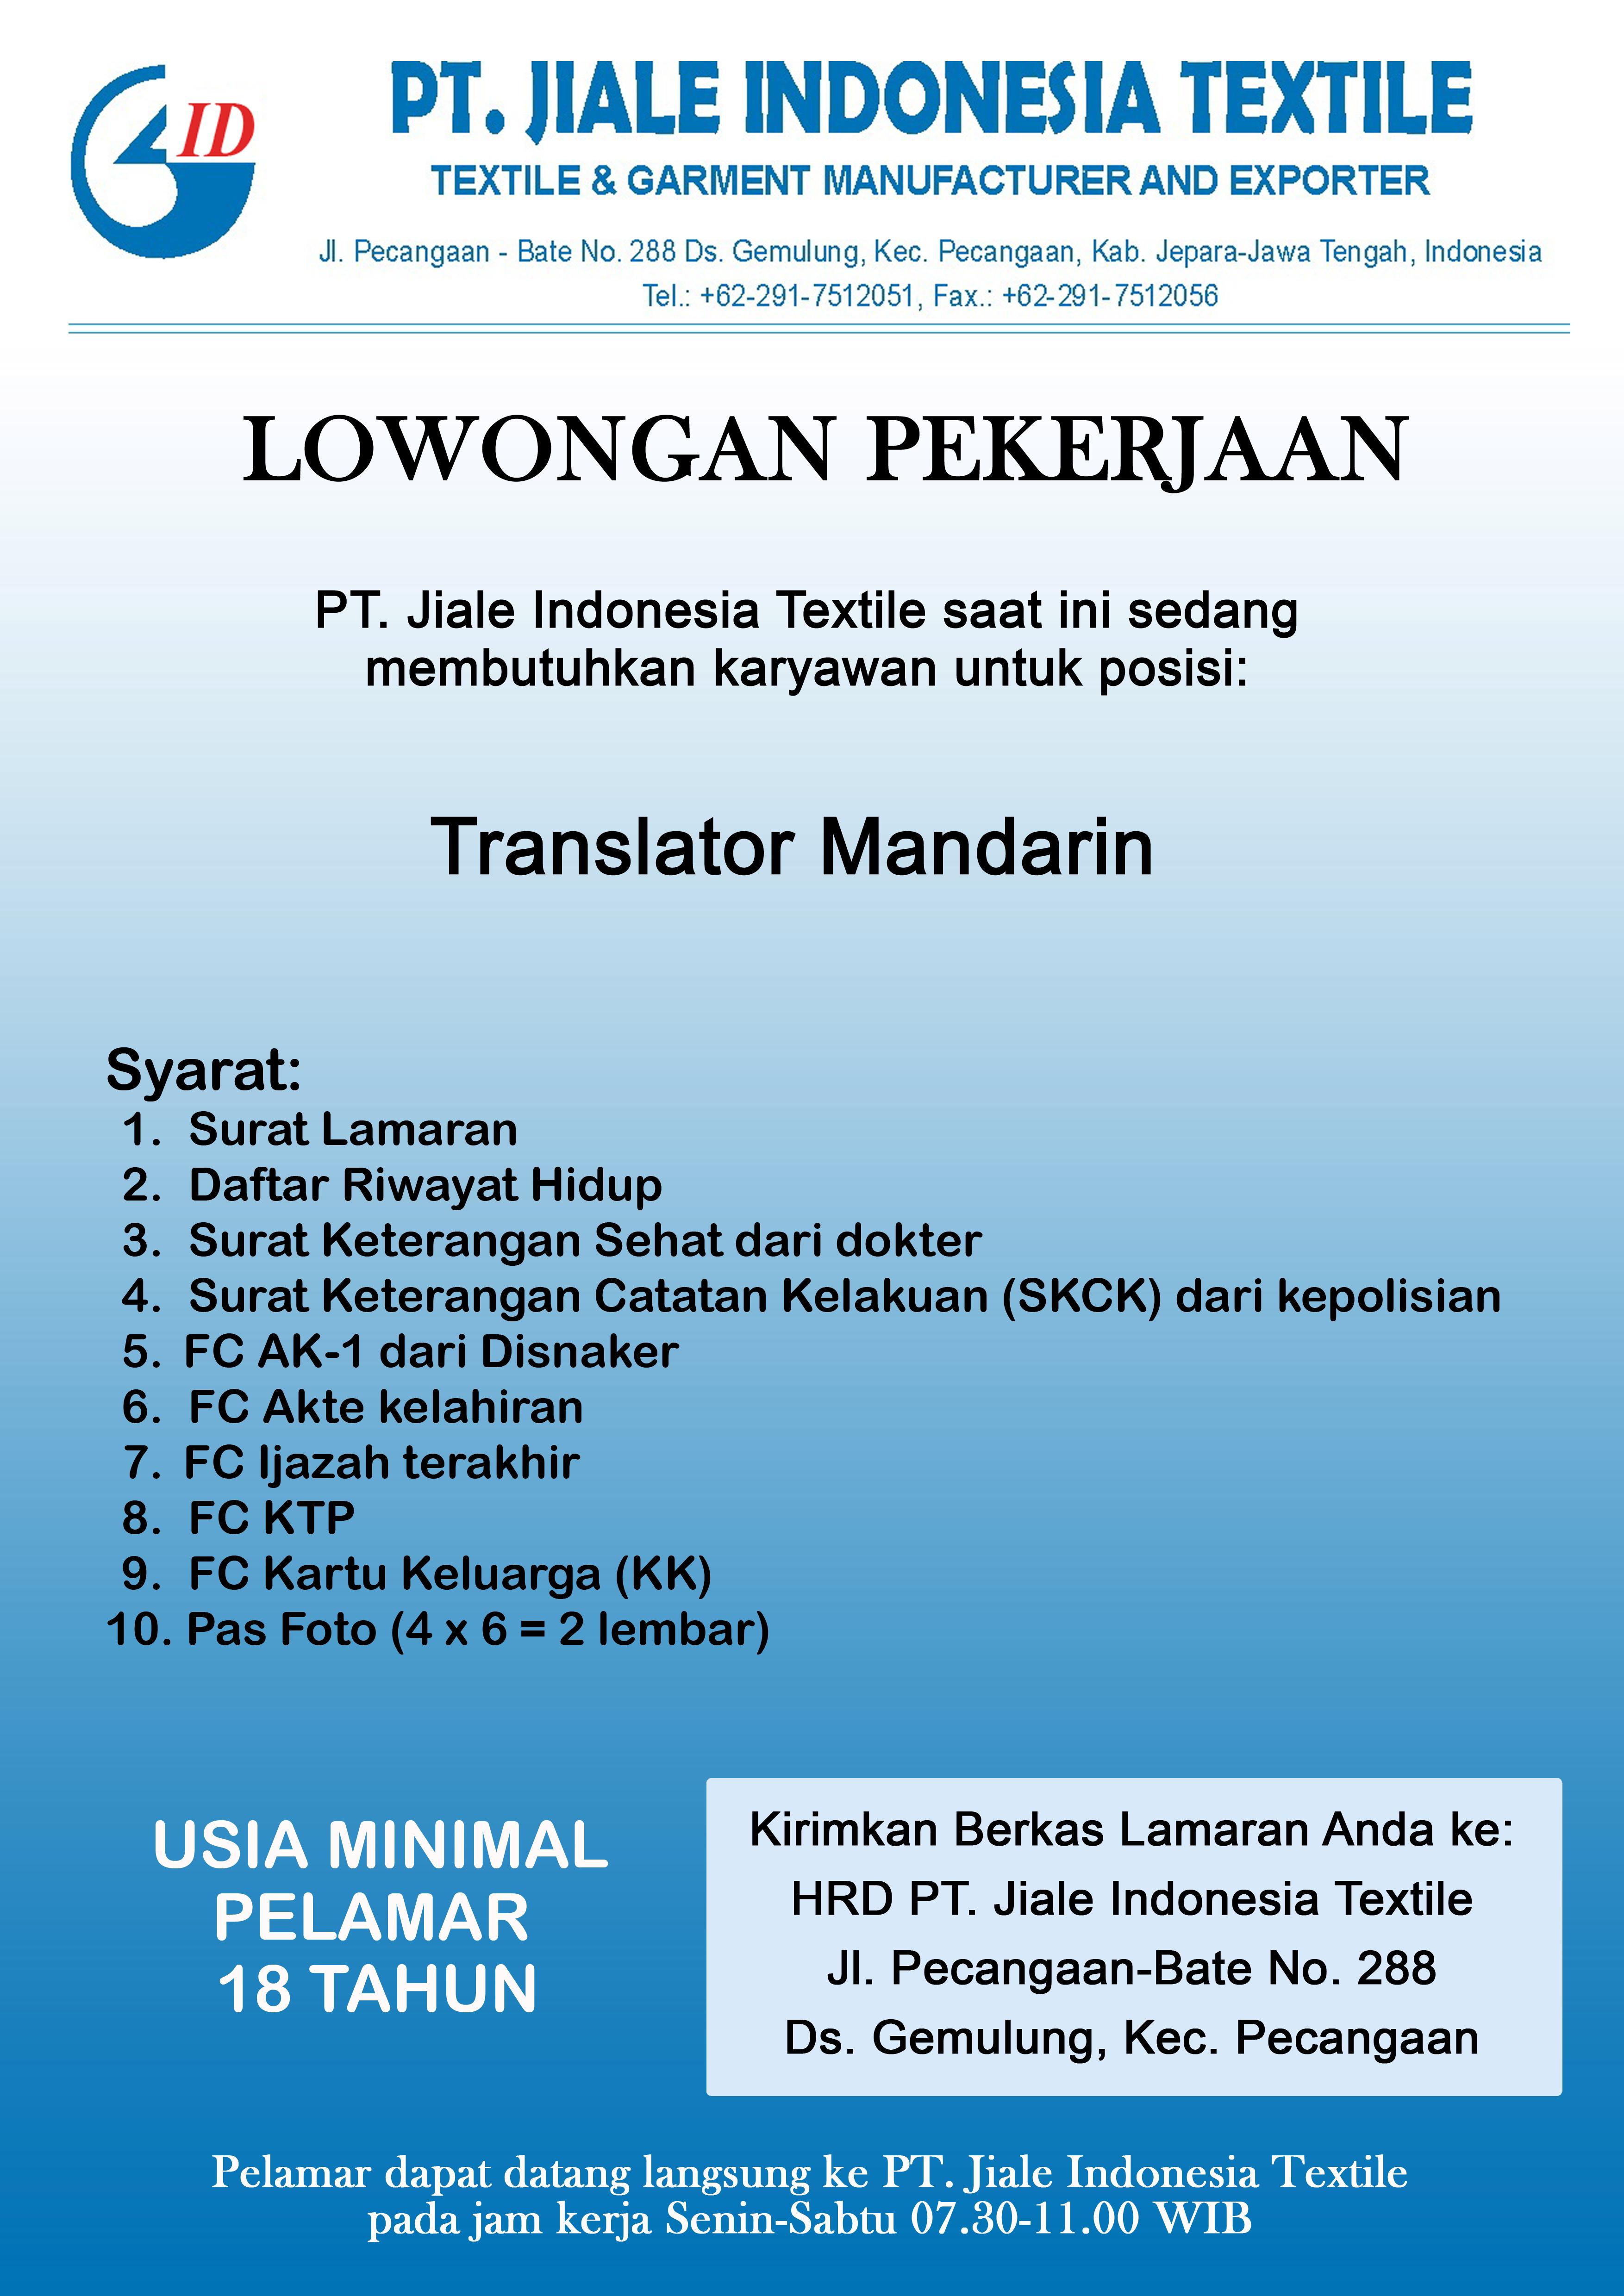 Lowongan Pekerjaan Bandung November 2015